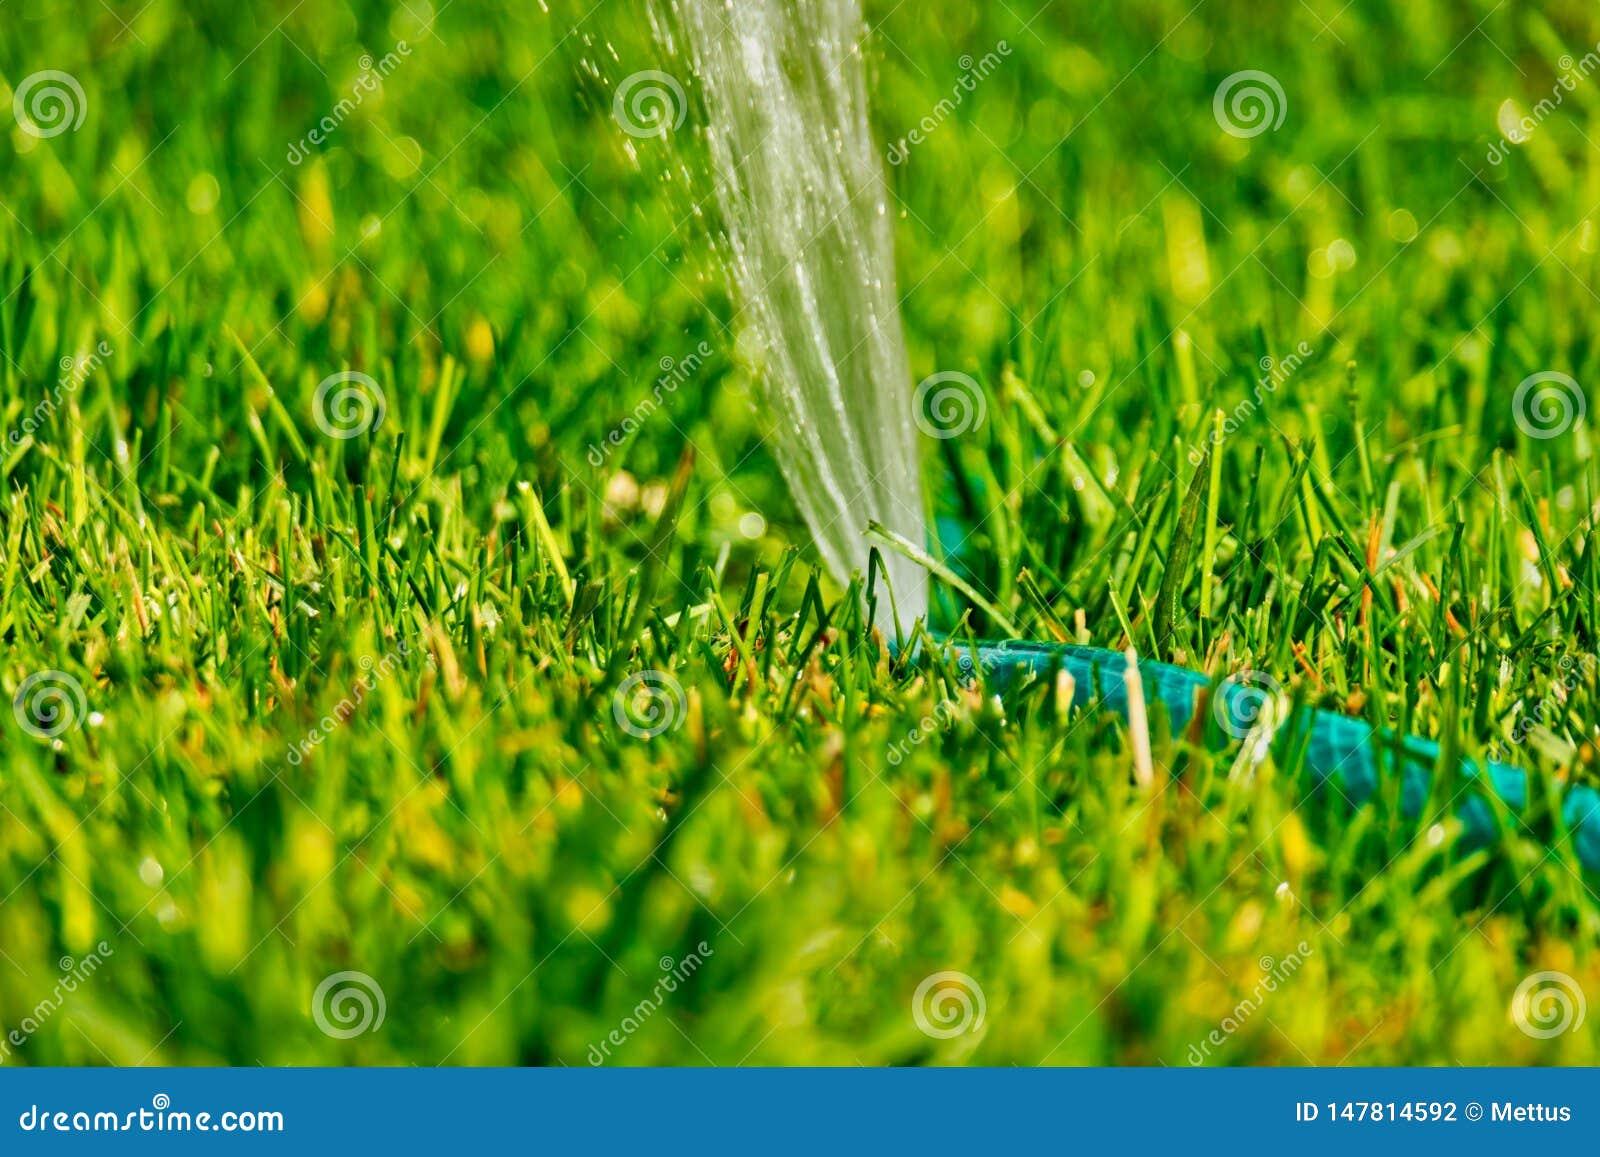 Diy Lawn Sprinkler Working In Back Yard Grass Stock Photo